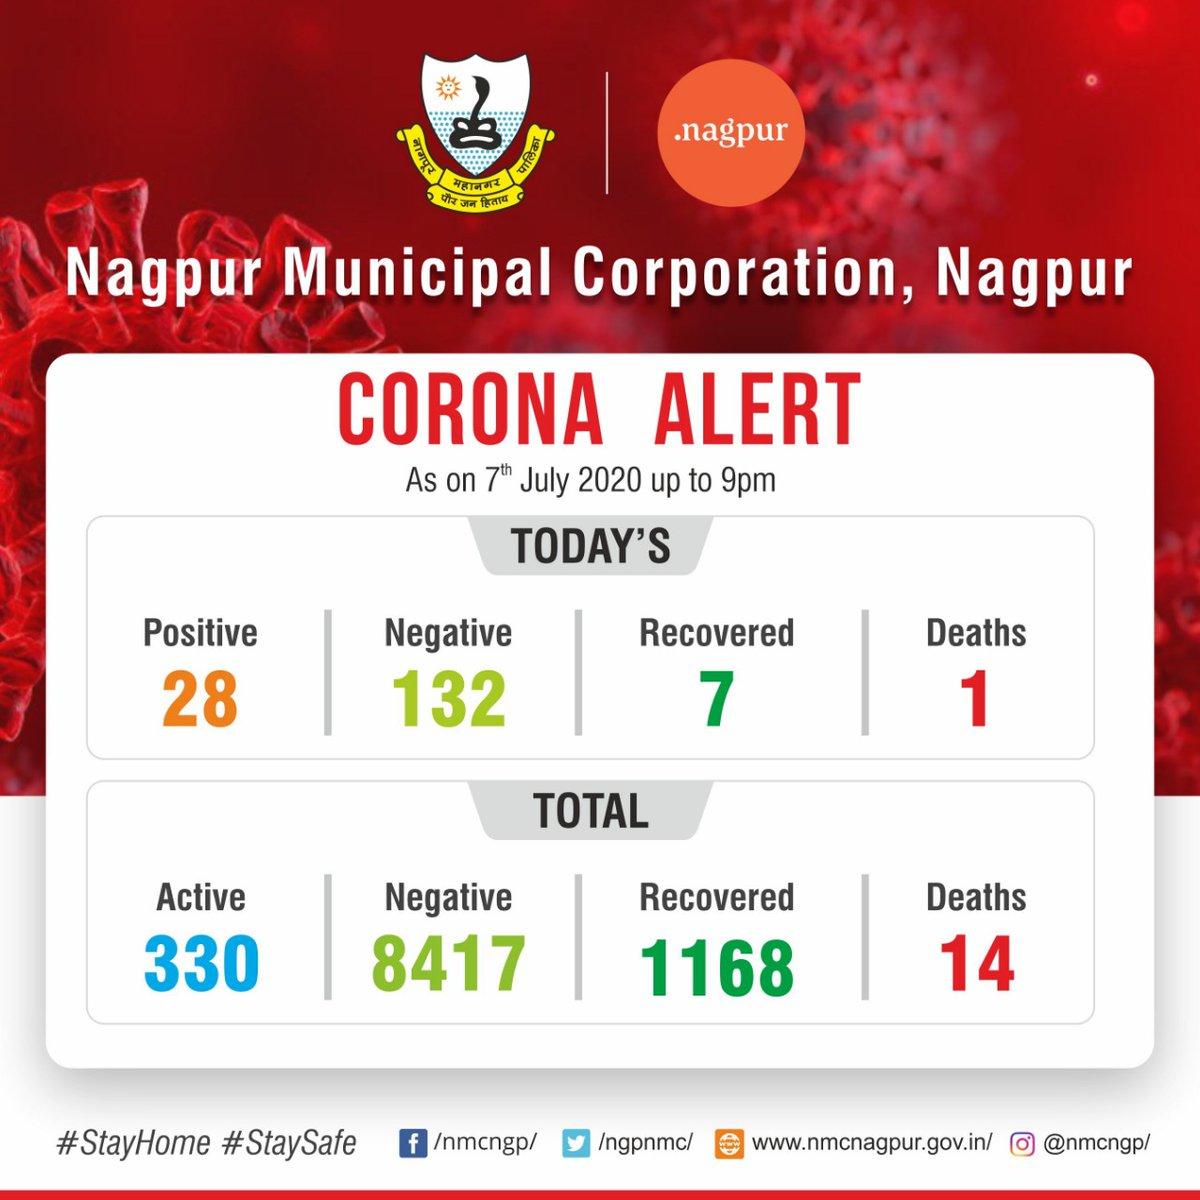 NMC #Covid_19 alert: total status update of the COVID19 cases as on 7 July 2020 #CoronaUpdatesInIndia #WarAgainstVirus #IndiaFightsCoronavirus https://t.co/wG5KiHFrBY